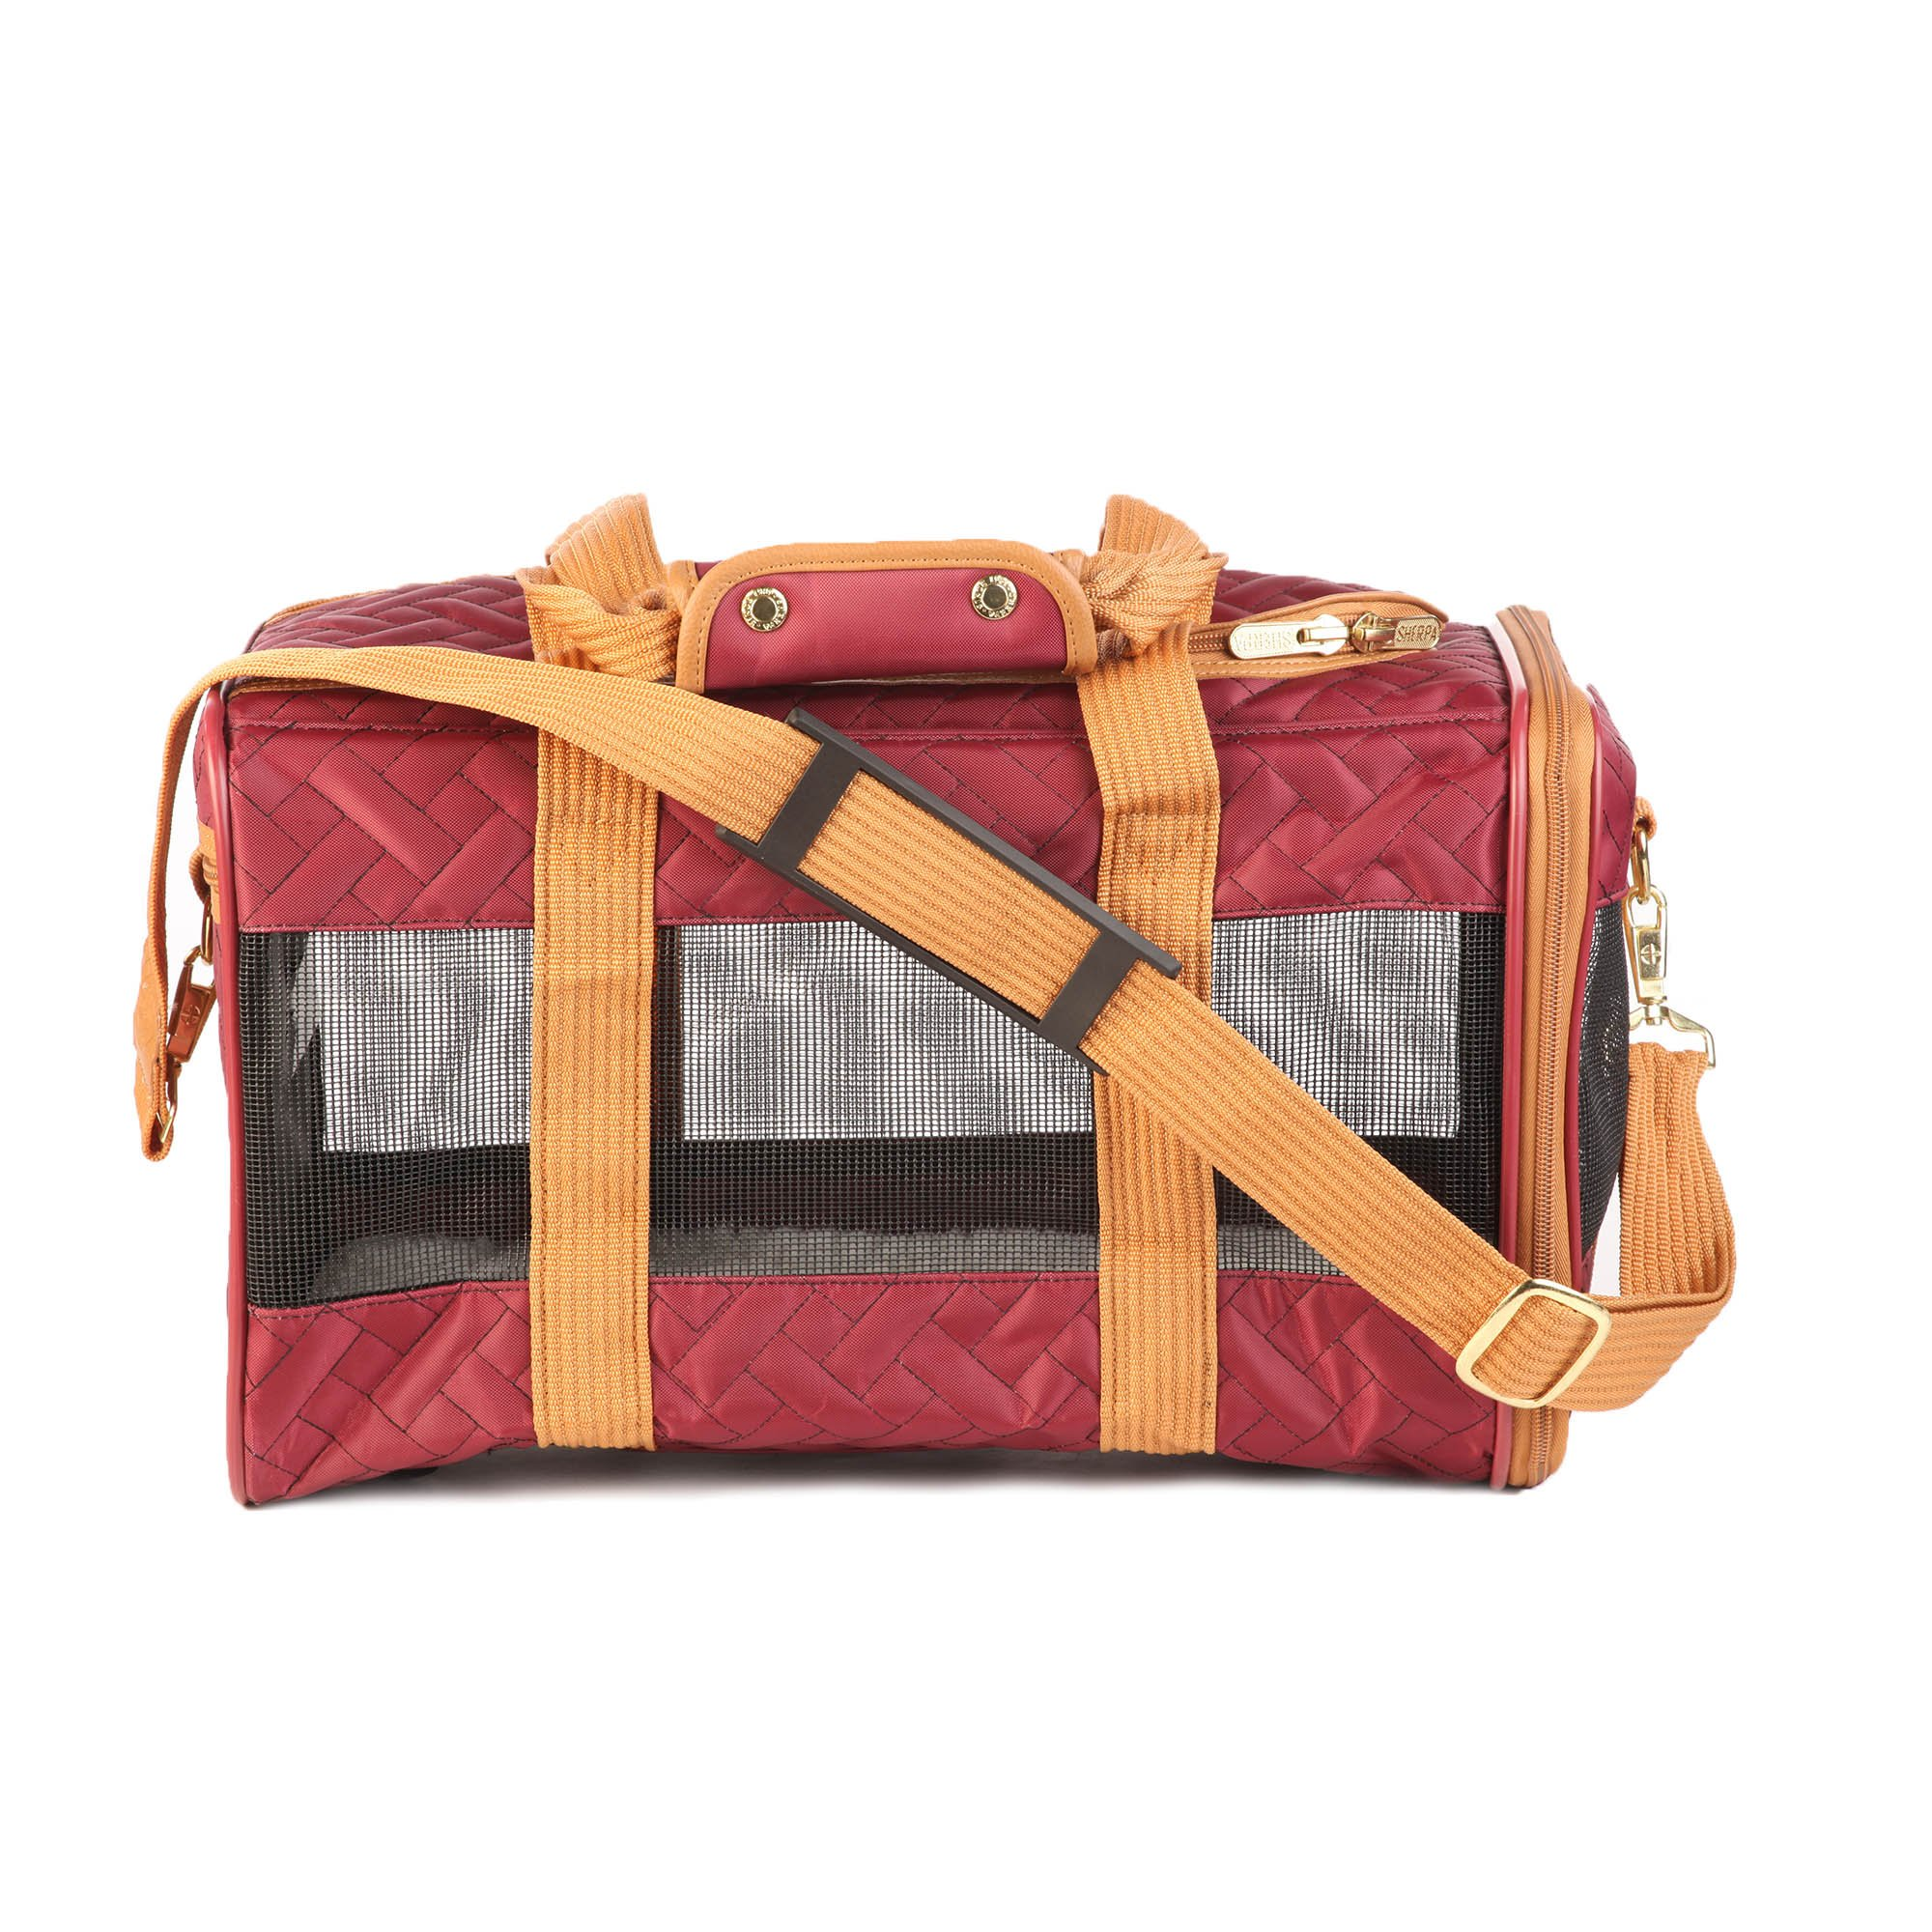 Sherpa Original Red & Orange Dog Carrier